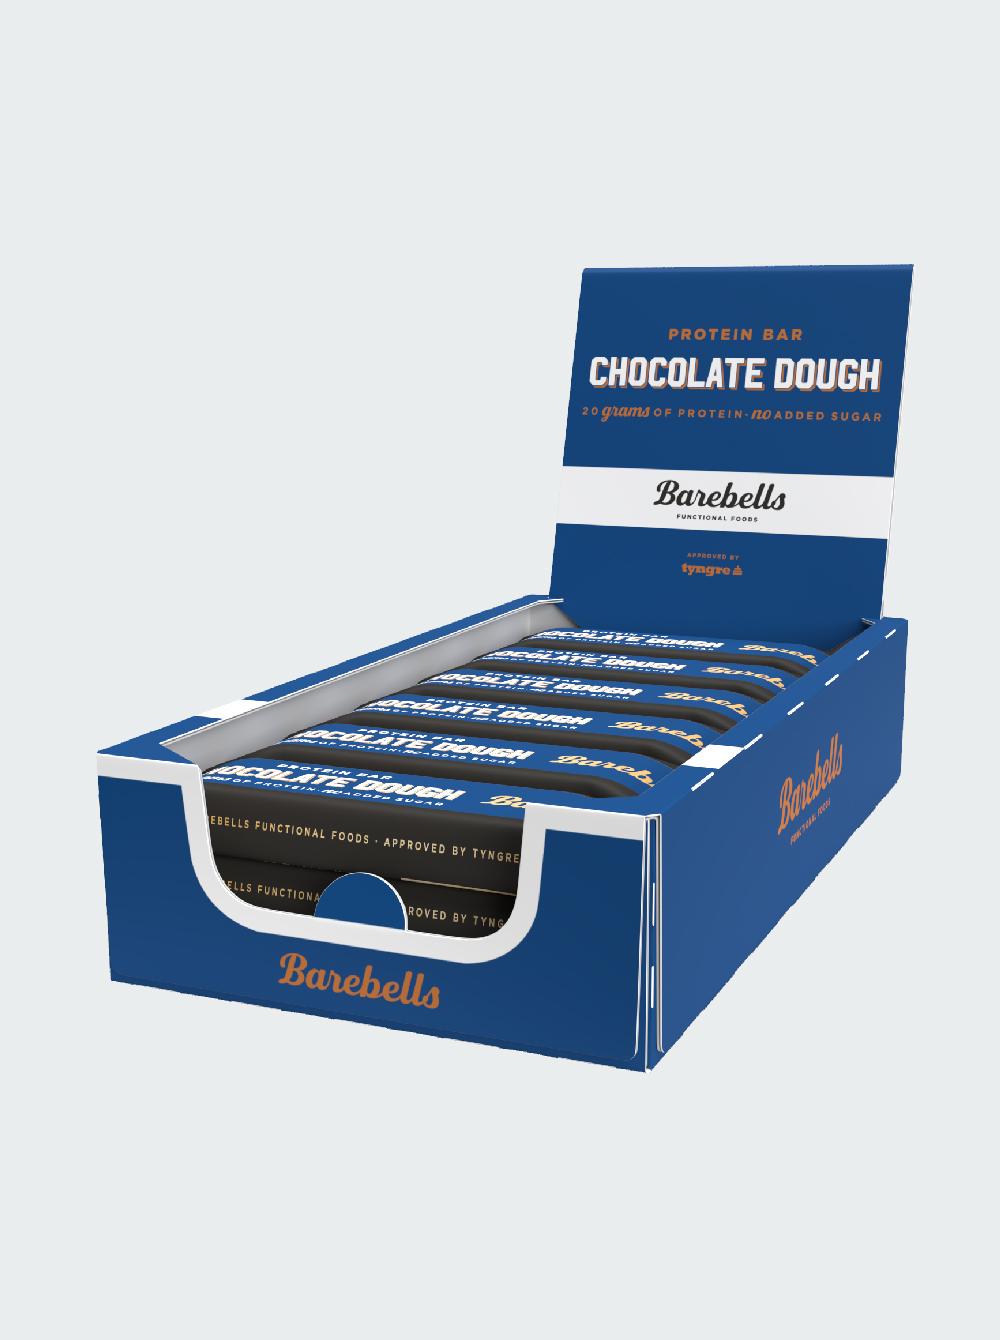 Barebells Chocolate Dough 12-pack